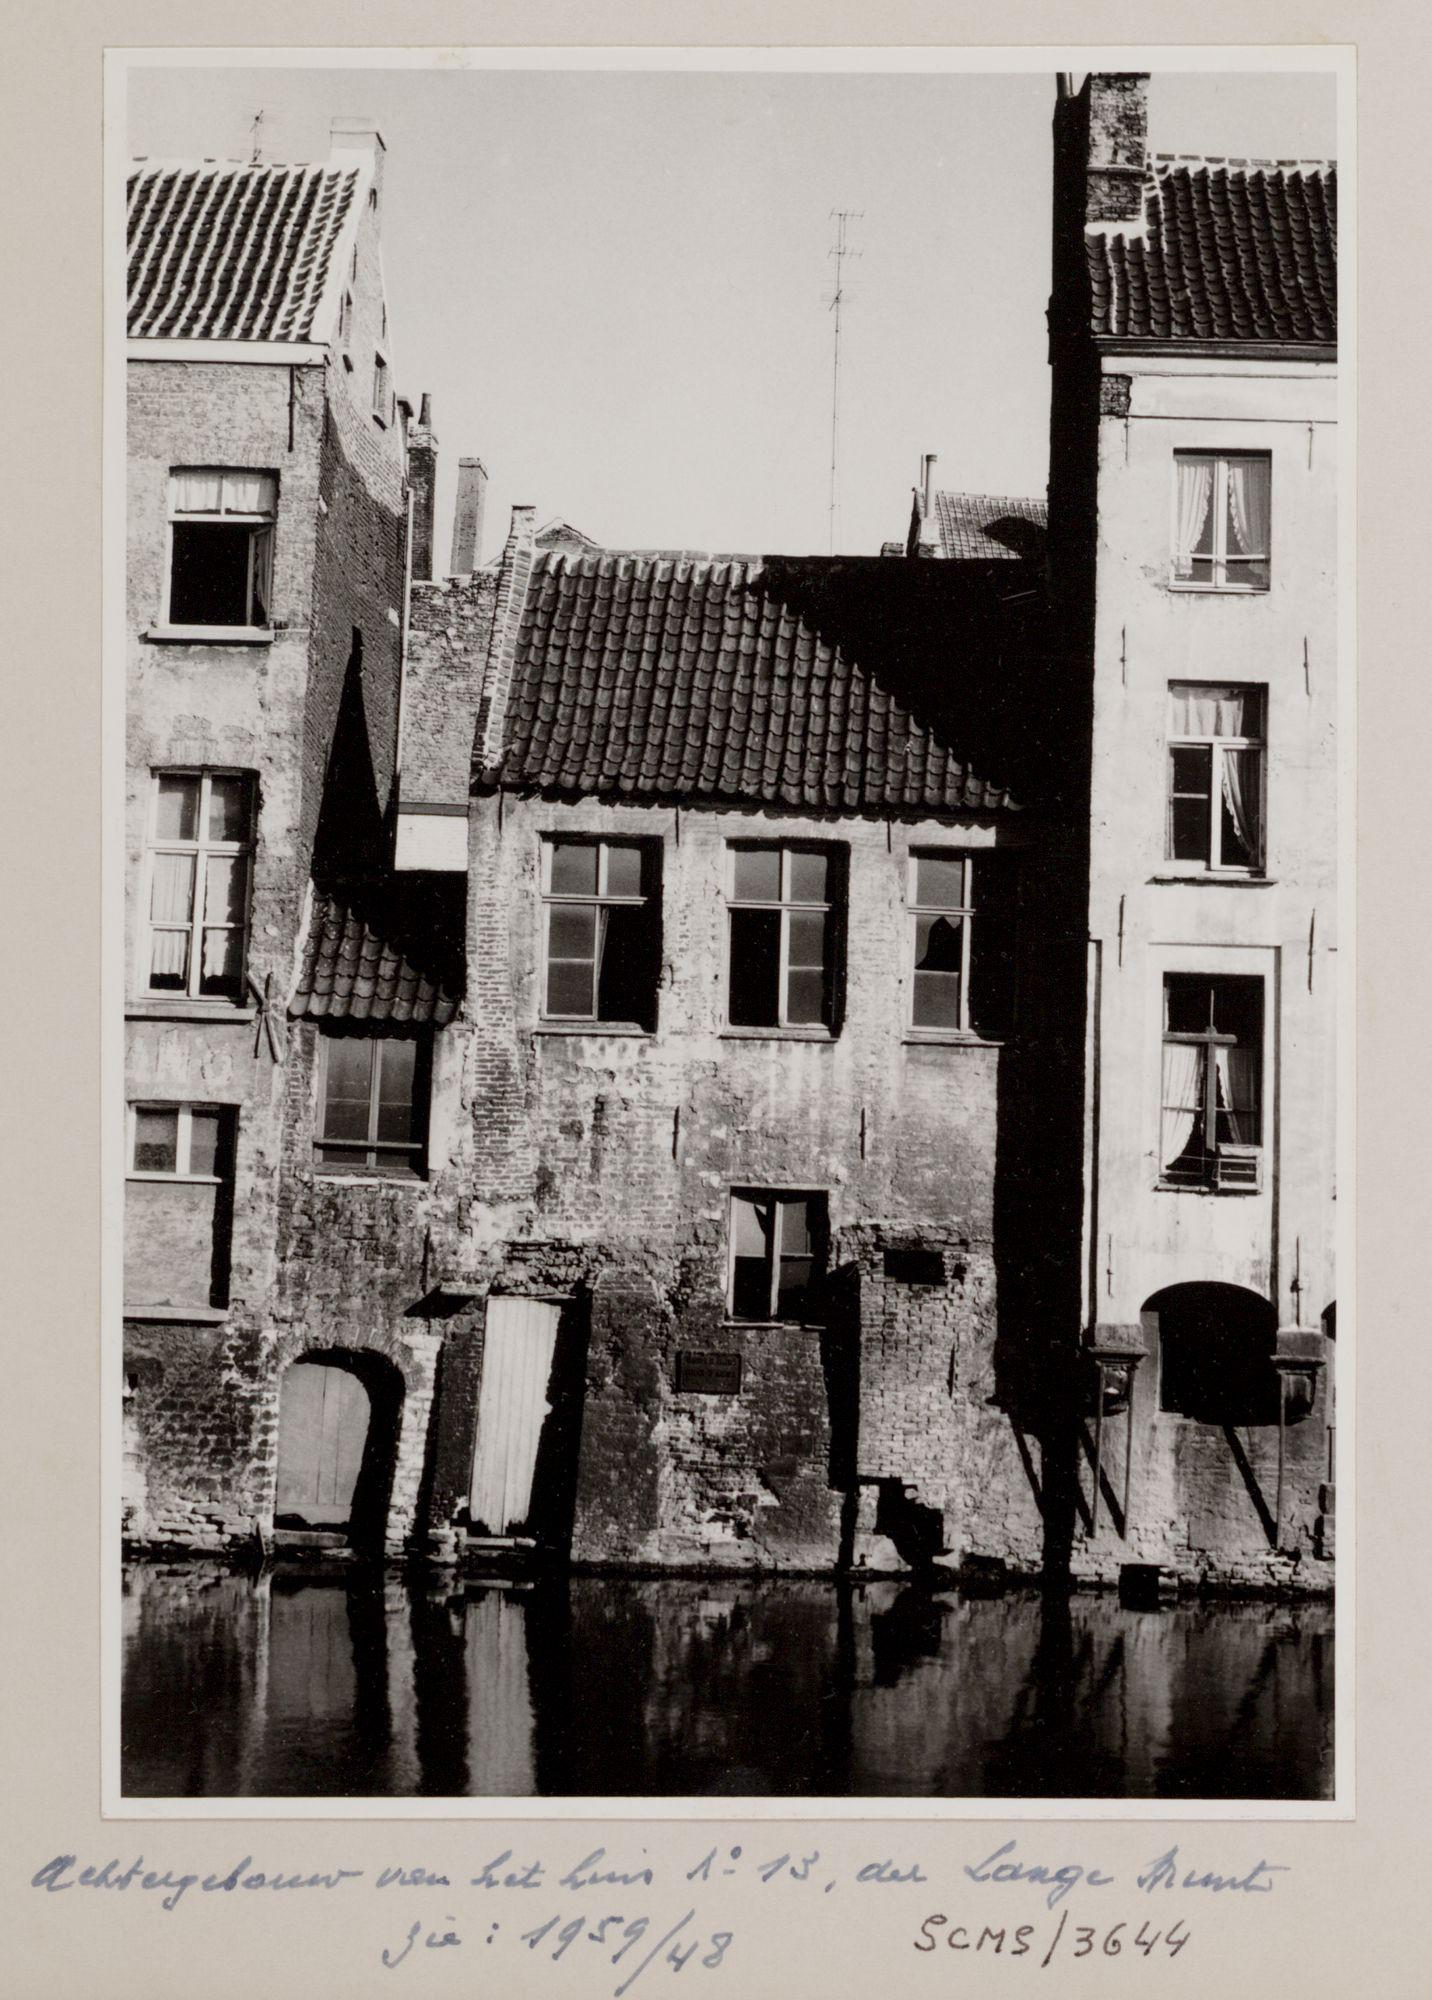 Gent: Leie en achtergevel van Langemunt 13